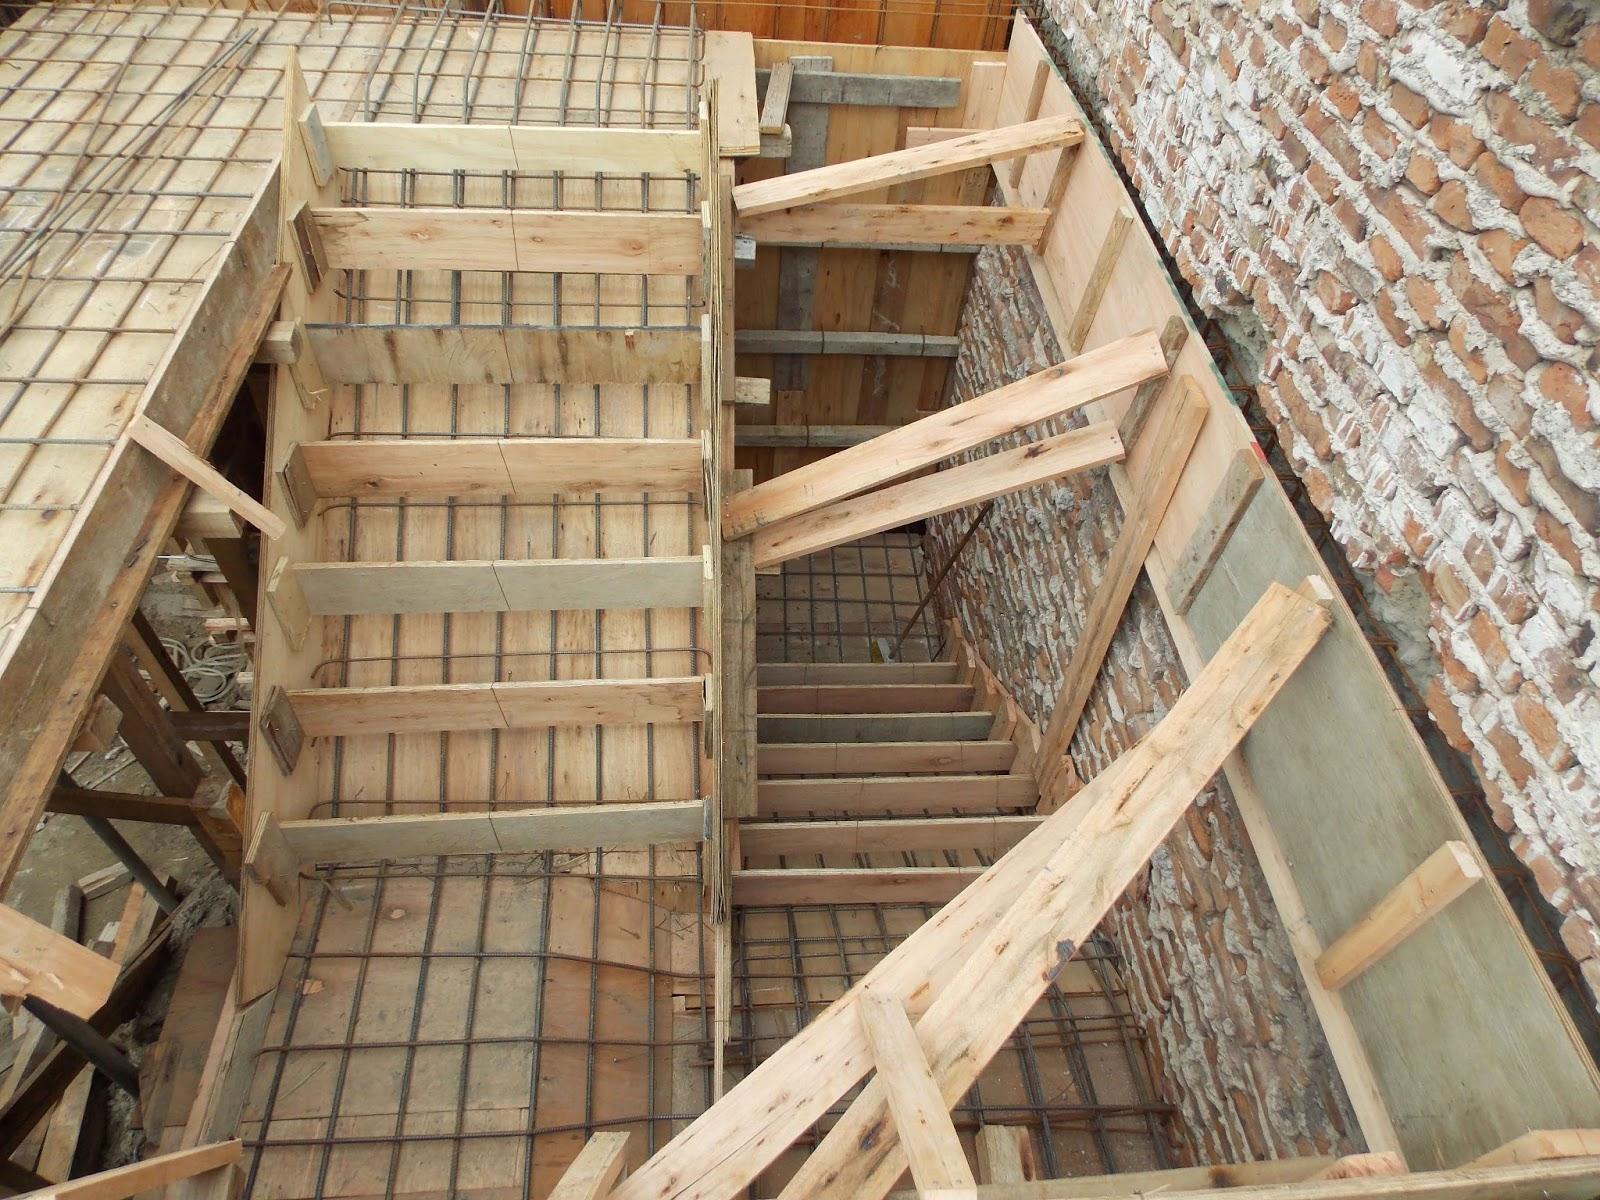 Fideicomiso obarrio 66 estructura for Construccion de escaleras de cemento